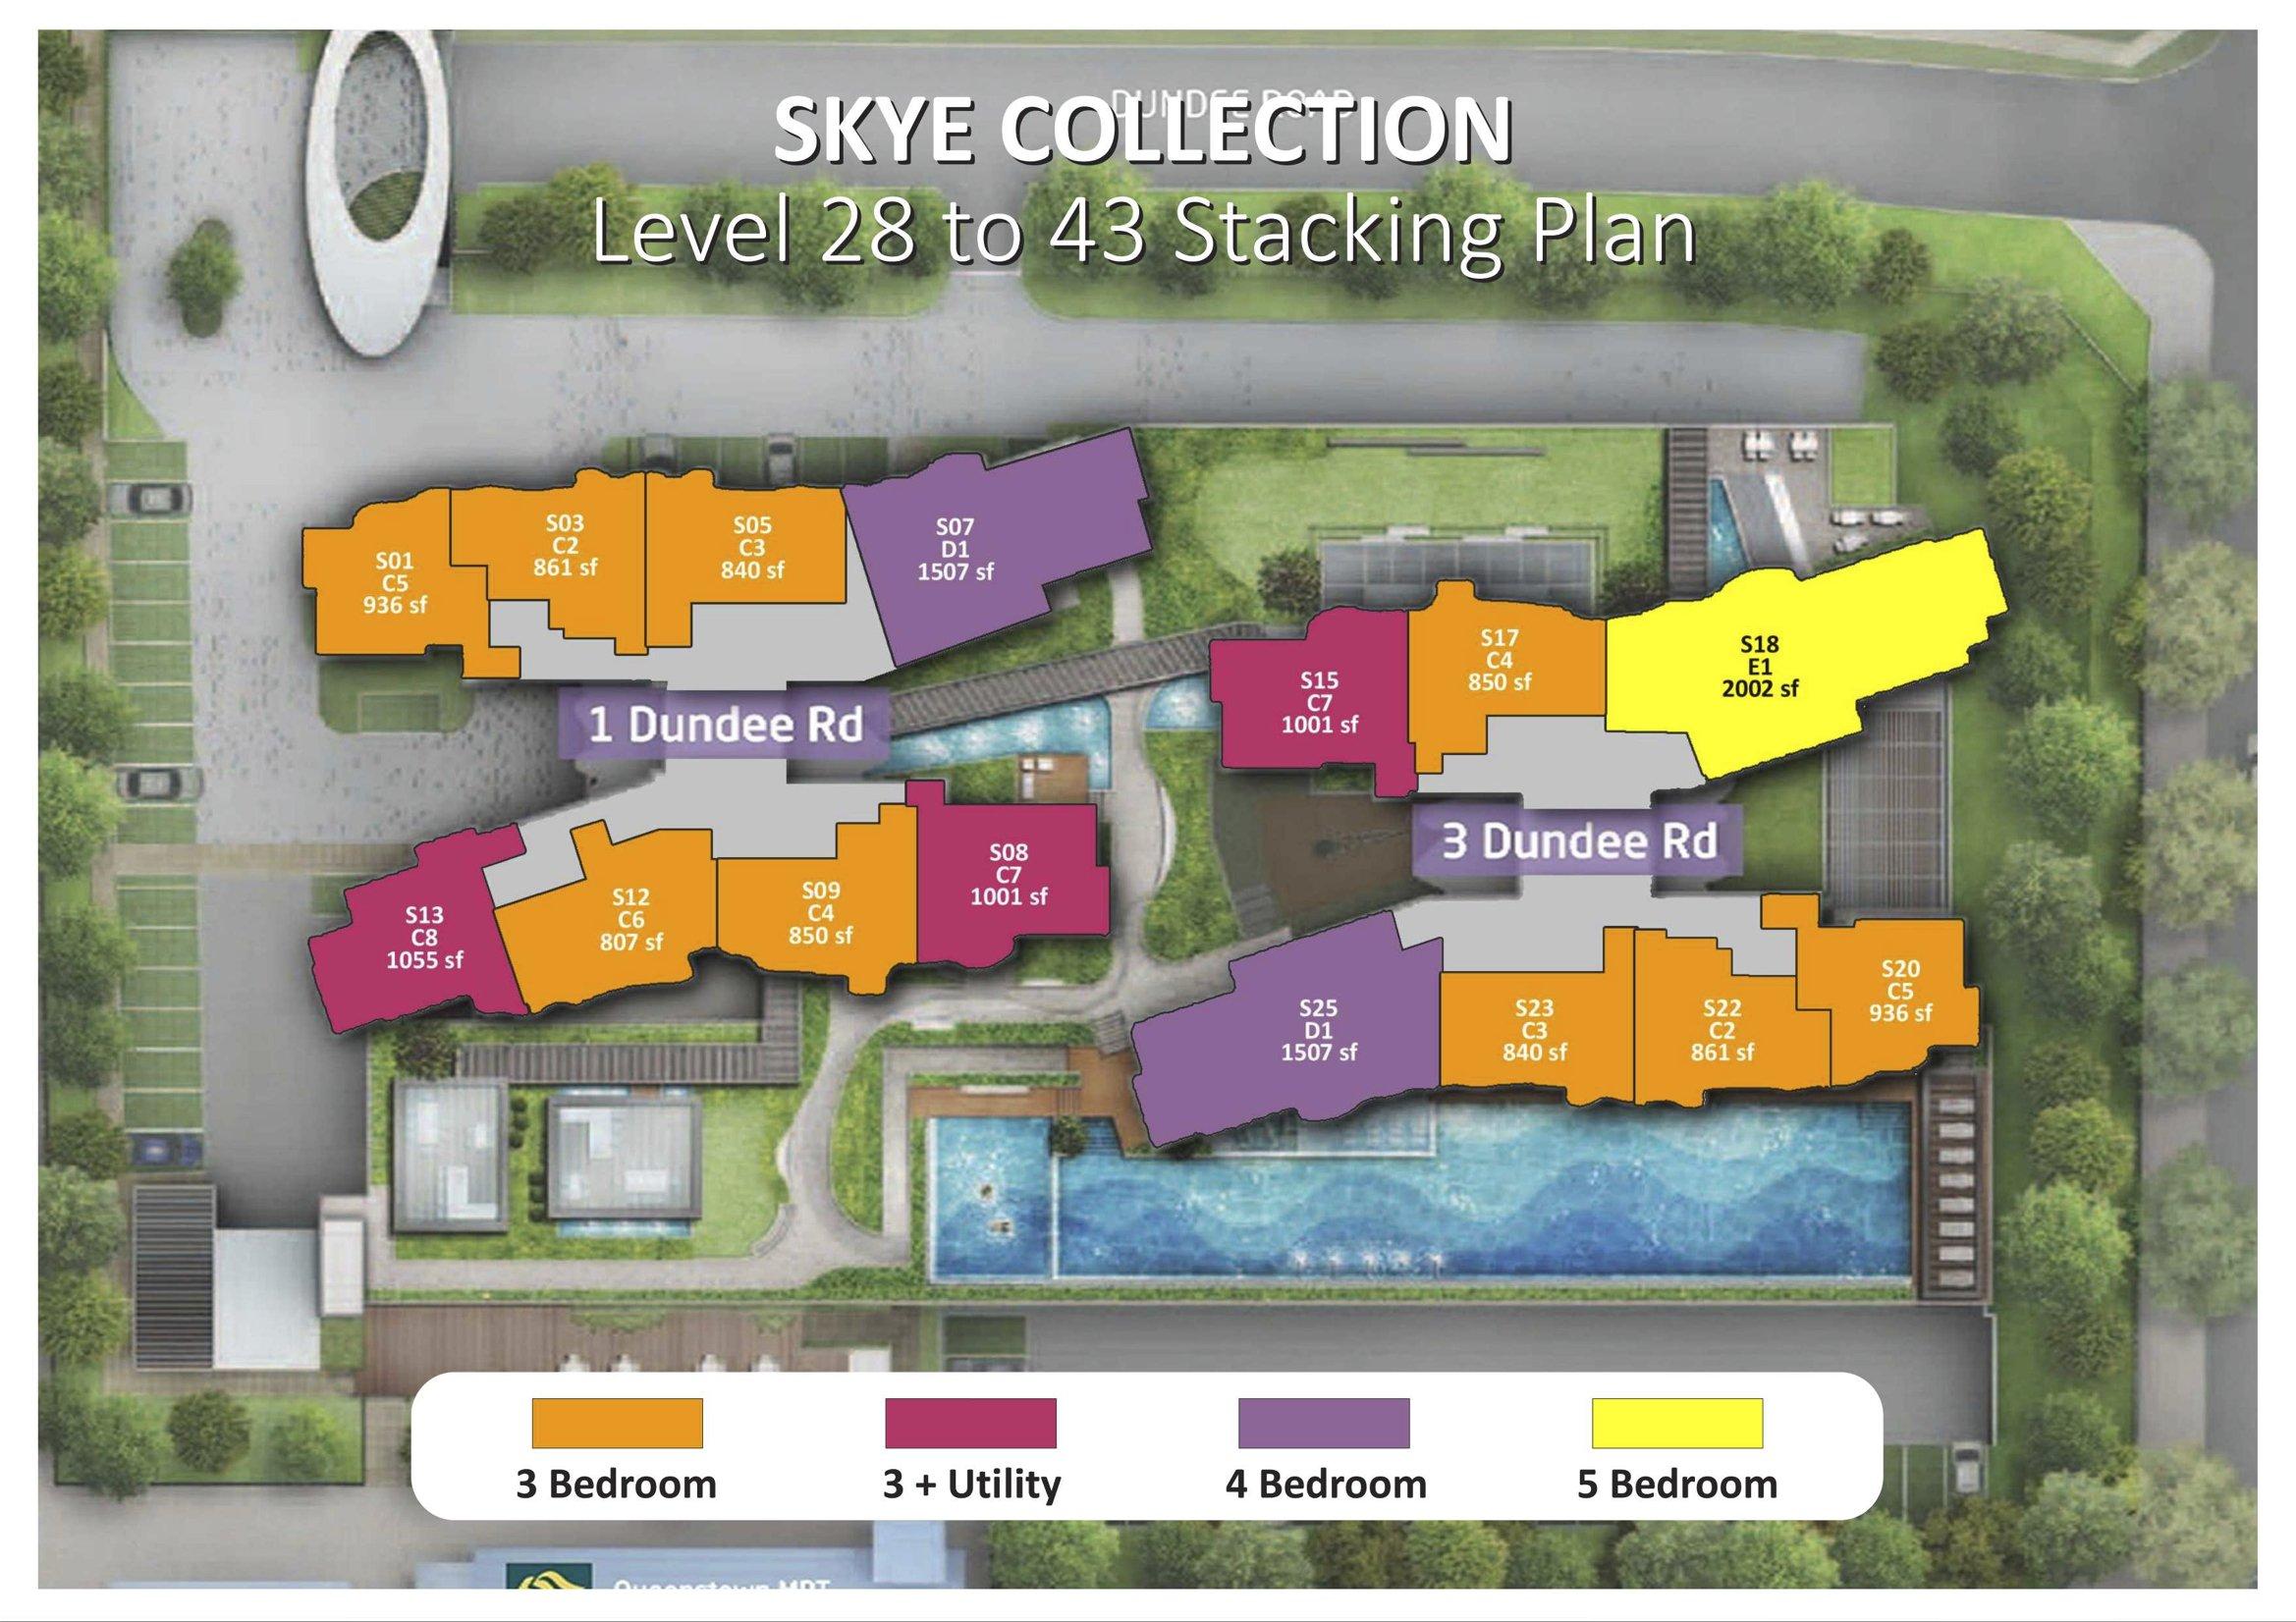 Queens Peak Stack Plan and unit distribution 28-43 storey